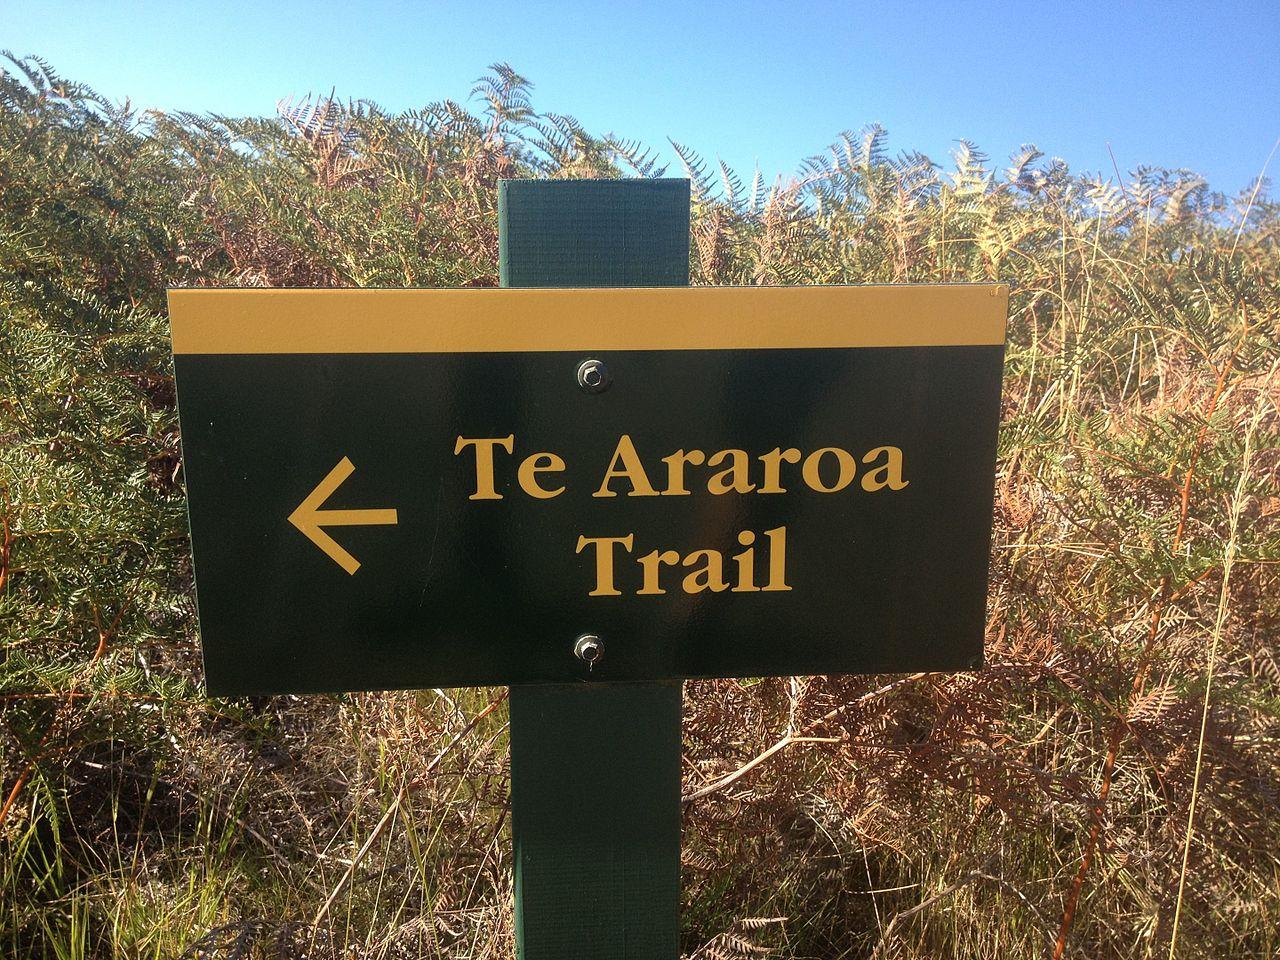 Auf zu neuen Taten: Ich wandere 2020 auf dem Te Araroa Trail in Neuseeland